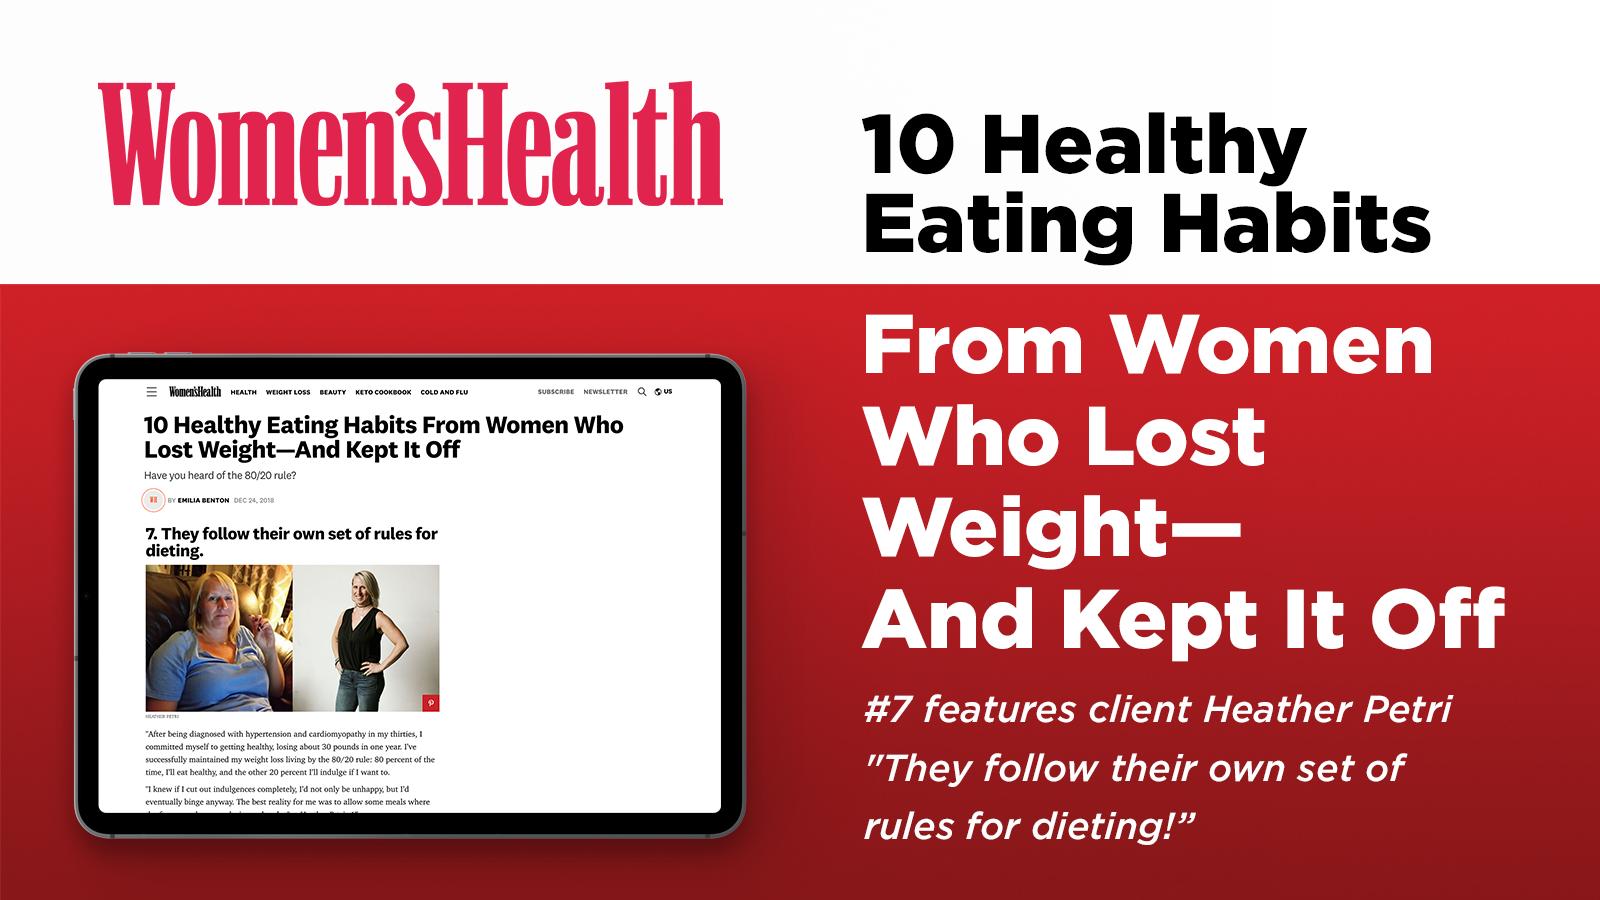 2018-12-21: Women's Health